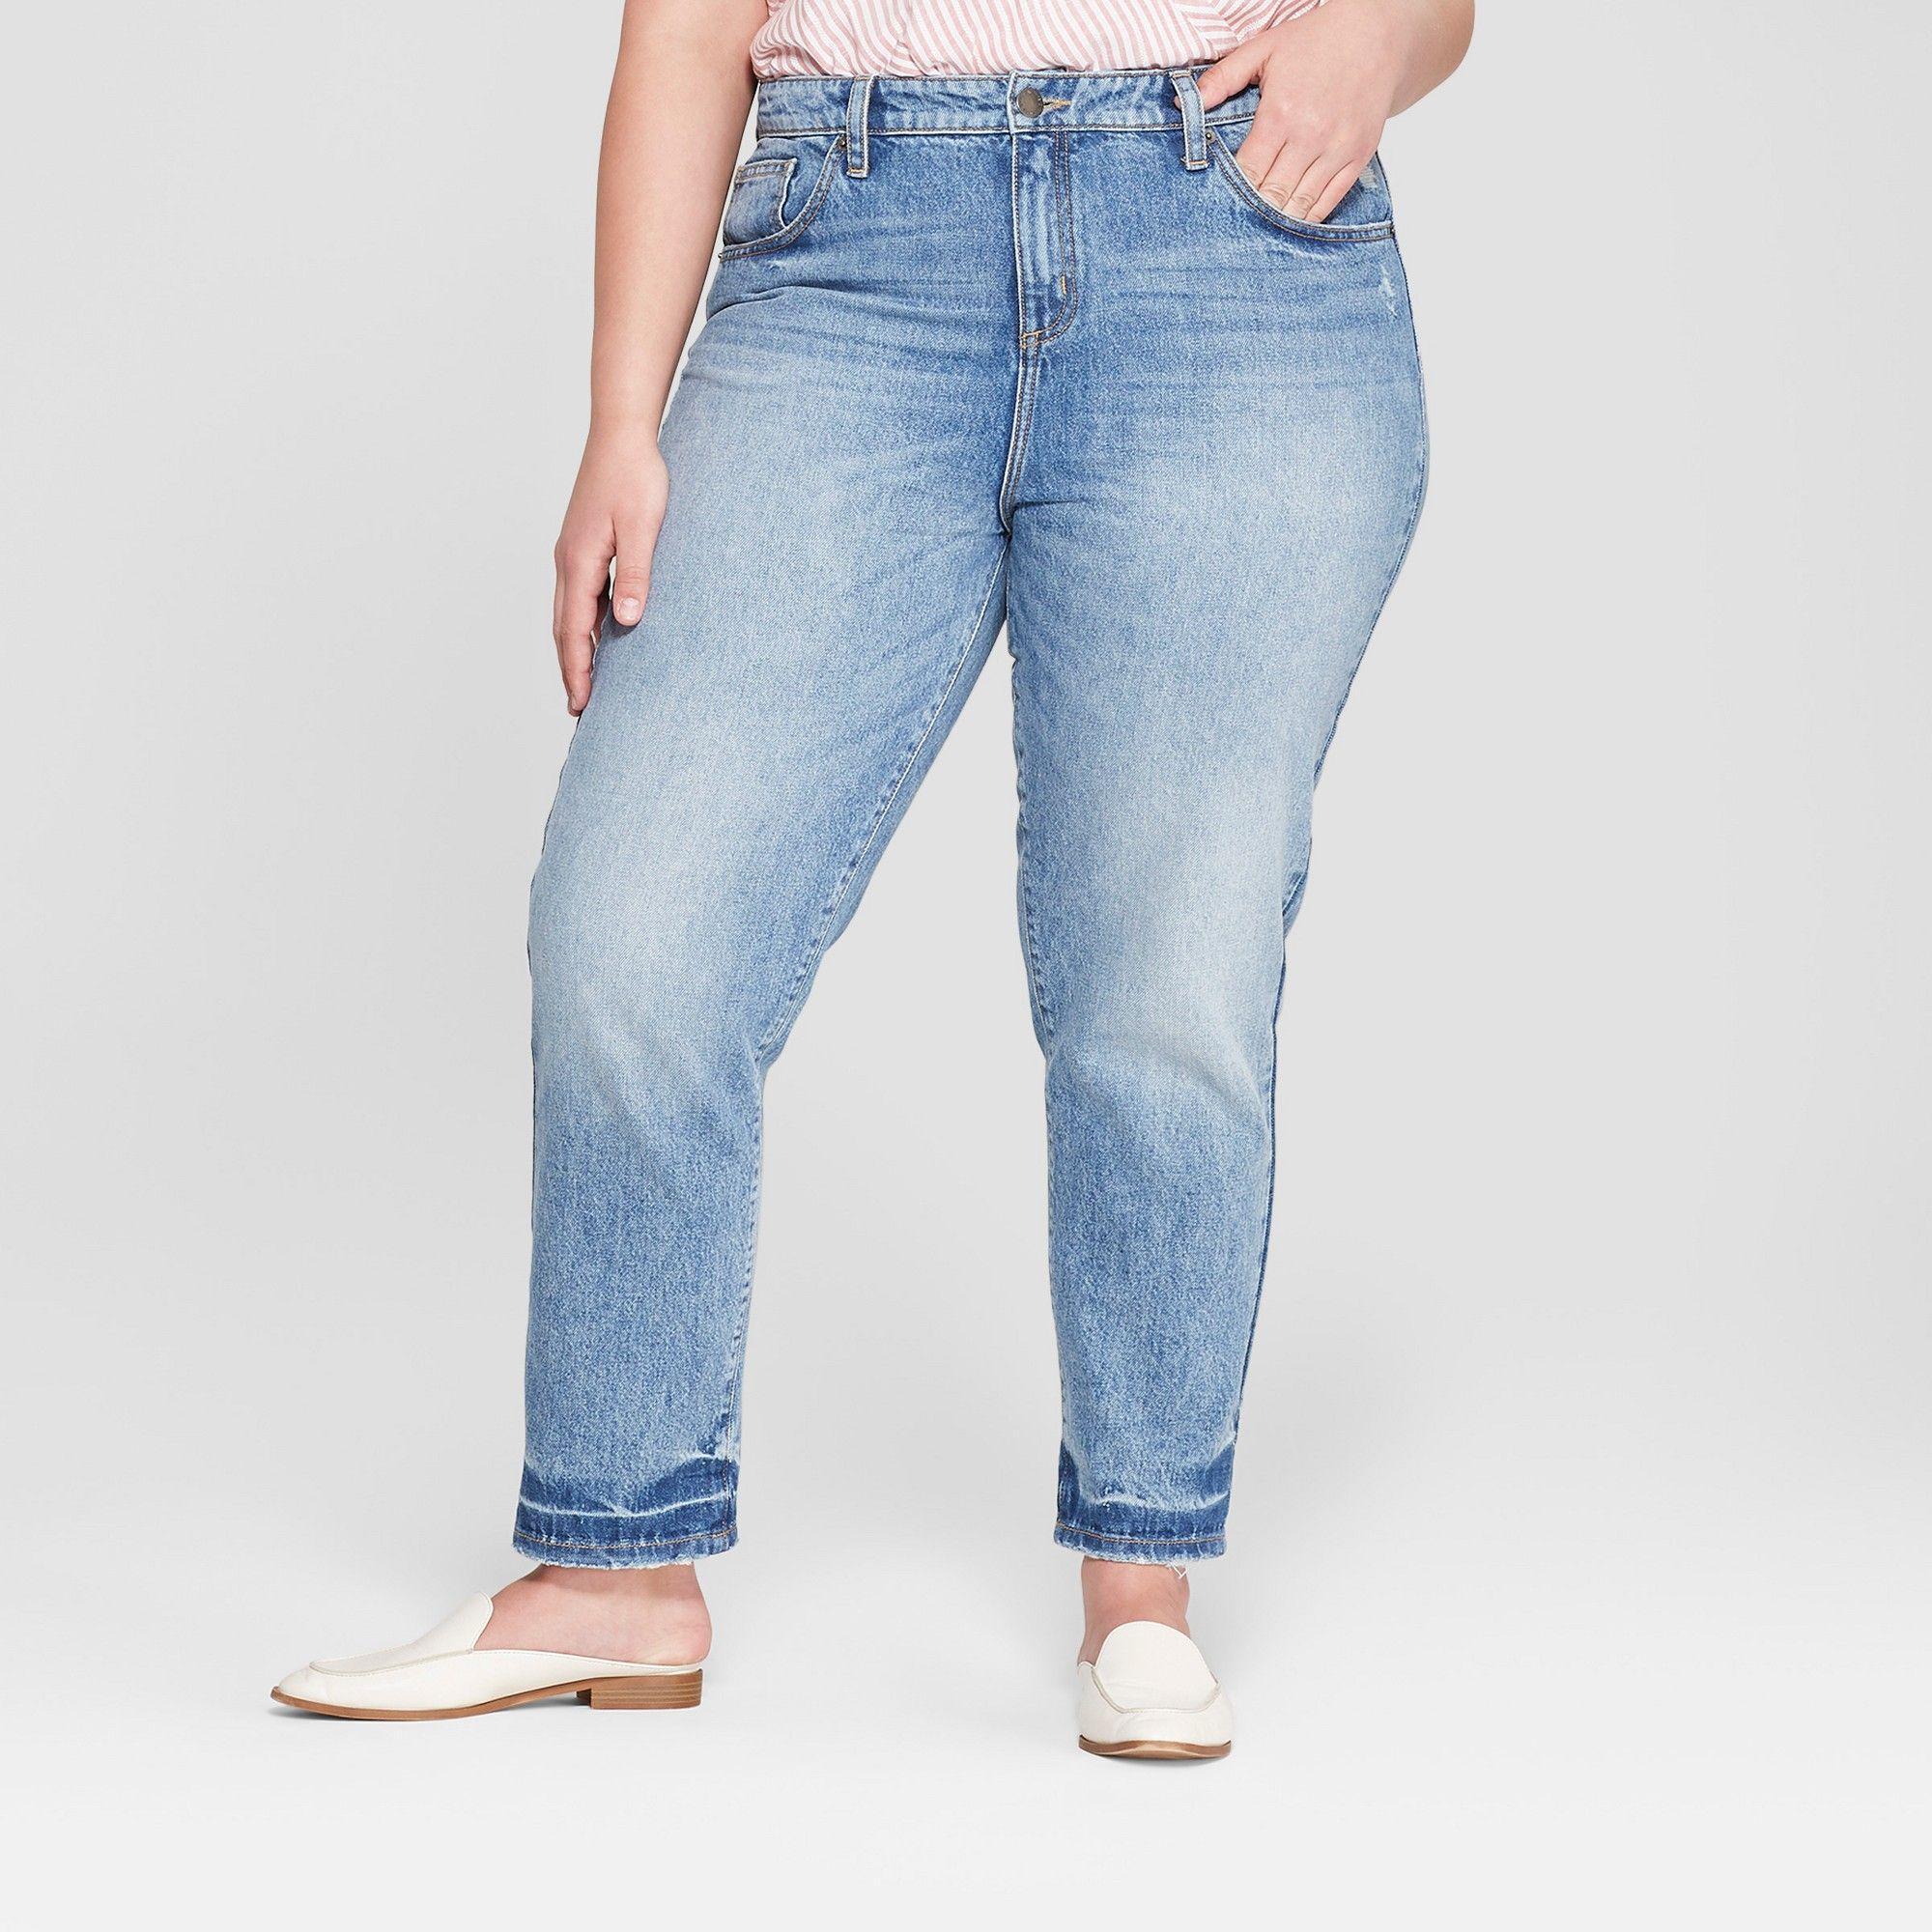 c98fb5c7a65 Women s Plus Size Raw Hem Straight Jeans - Universal Thread Light Wash 16W